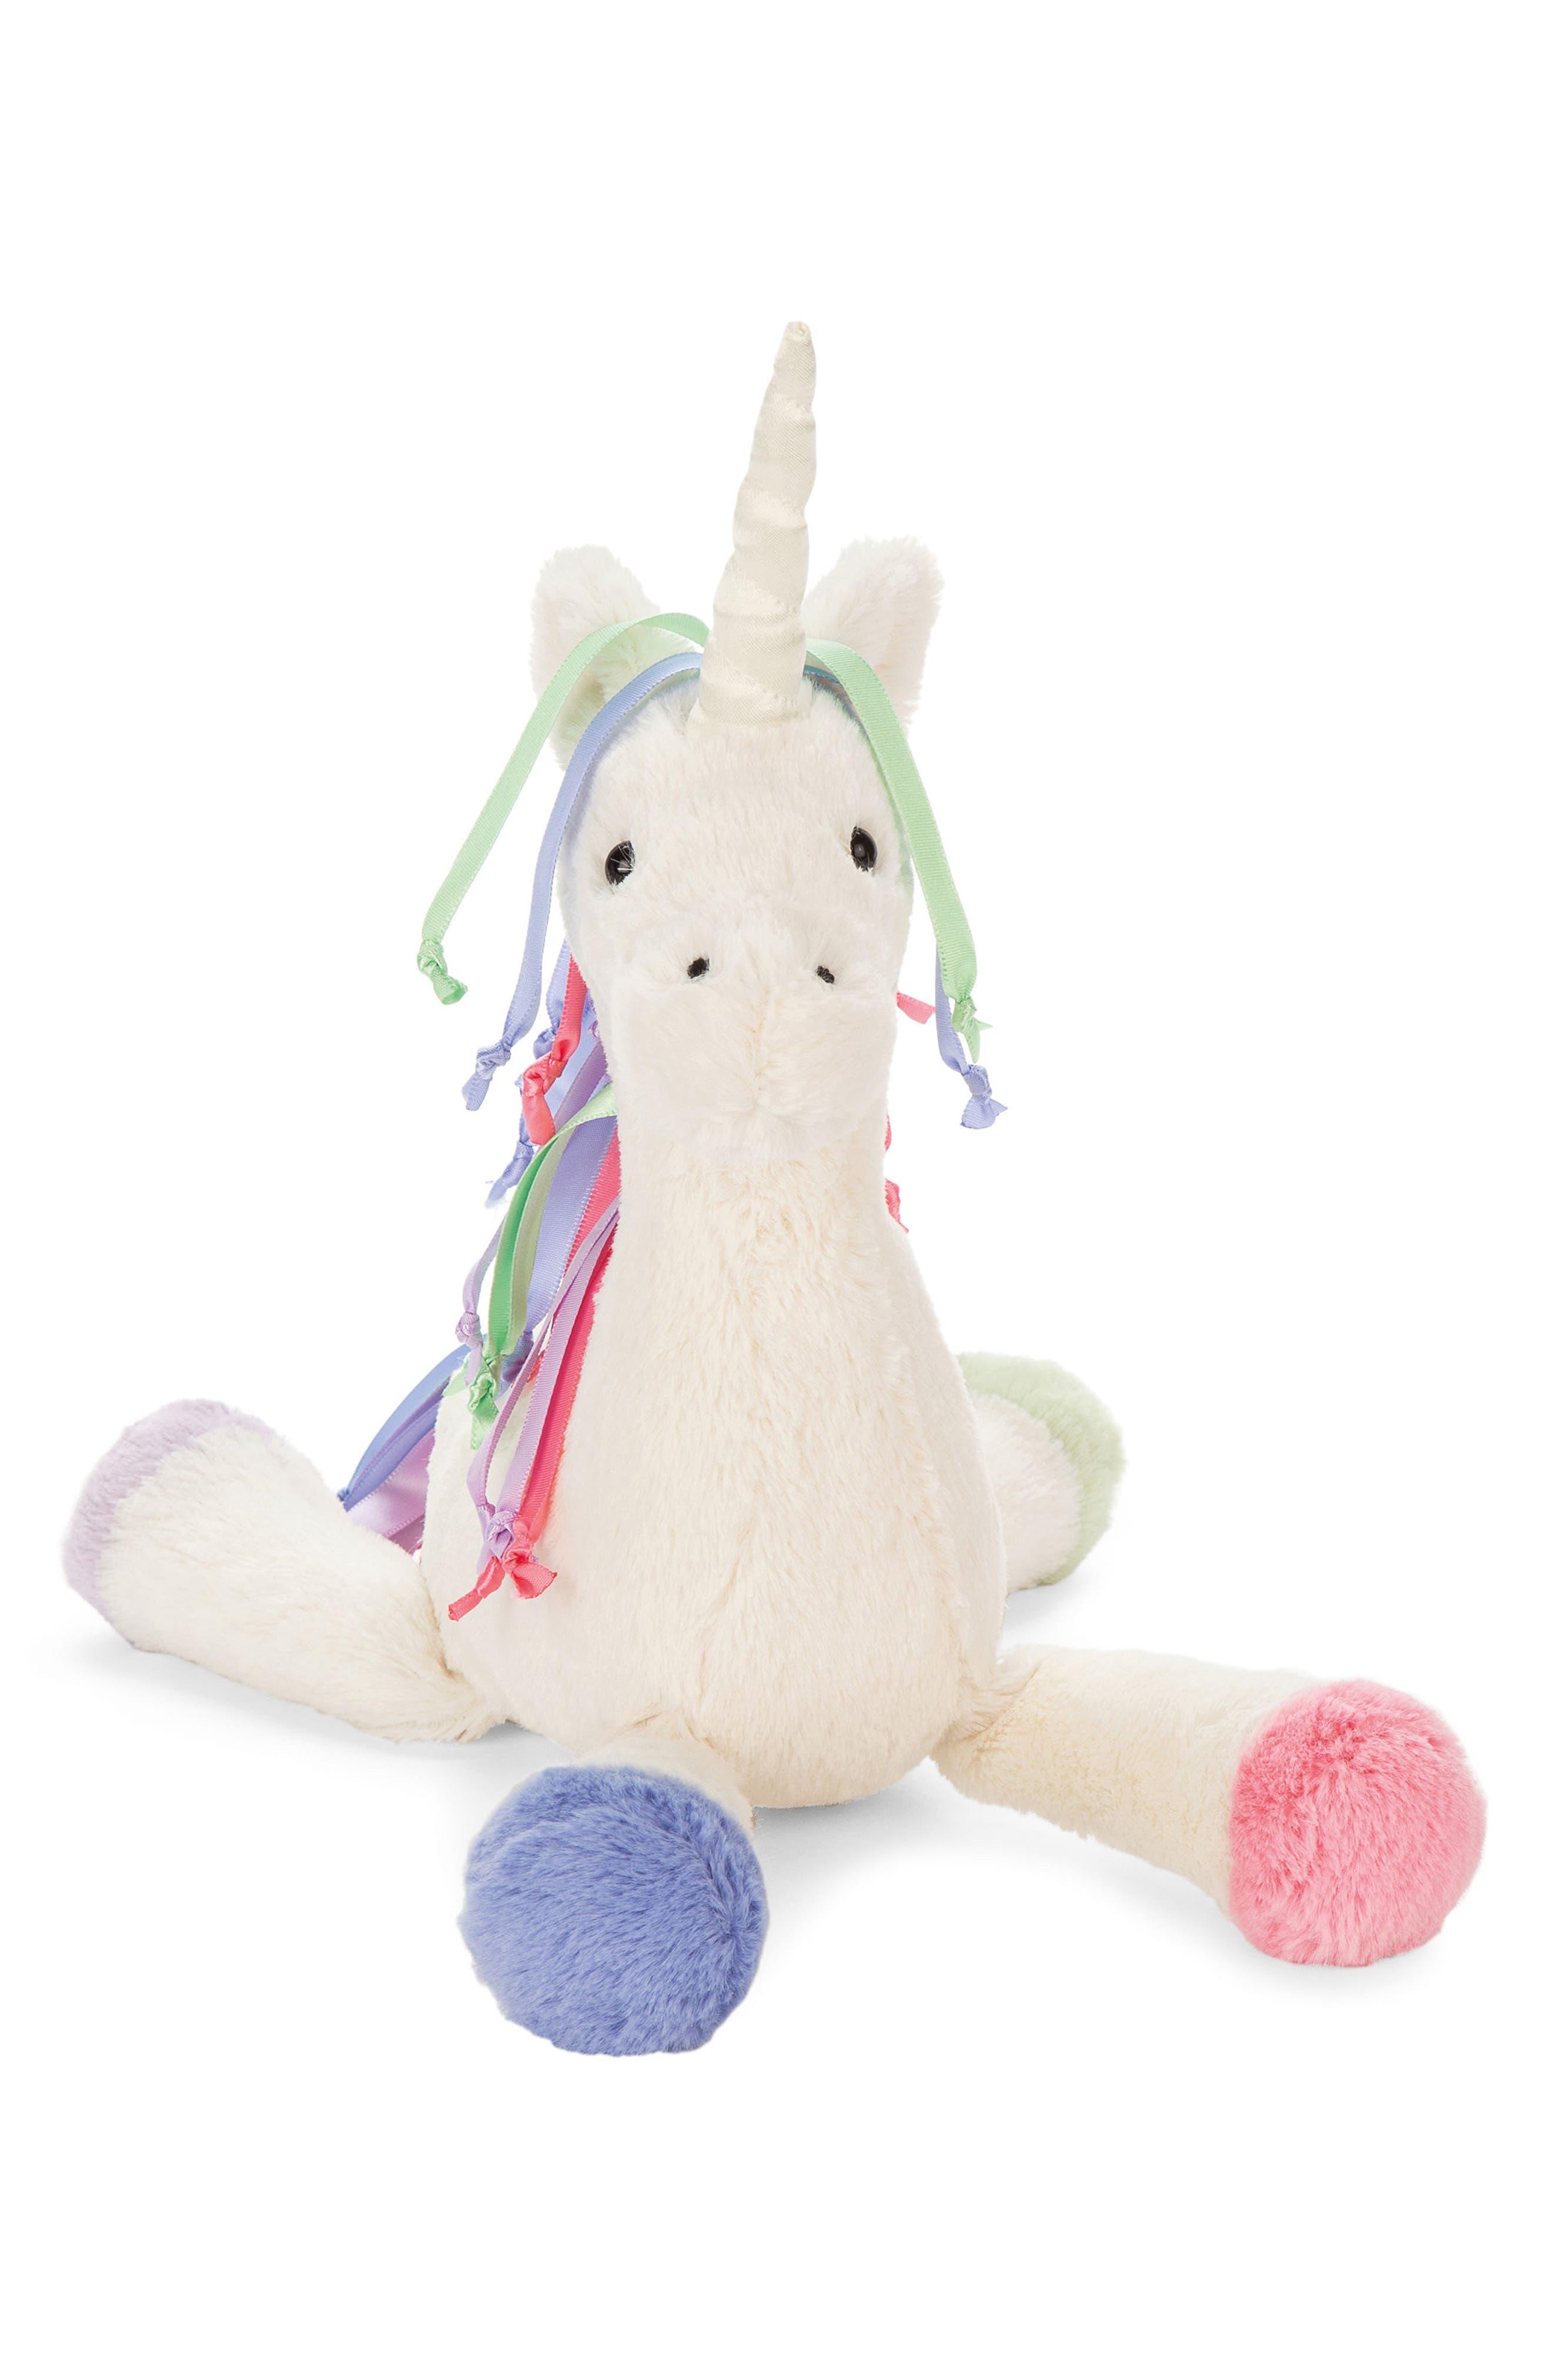 Lollopylou Unicorn Chime Stuffed Animal,                             Main thumbnail 1, color,                             Cream